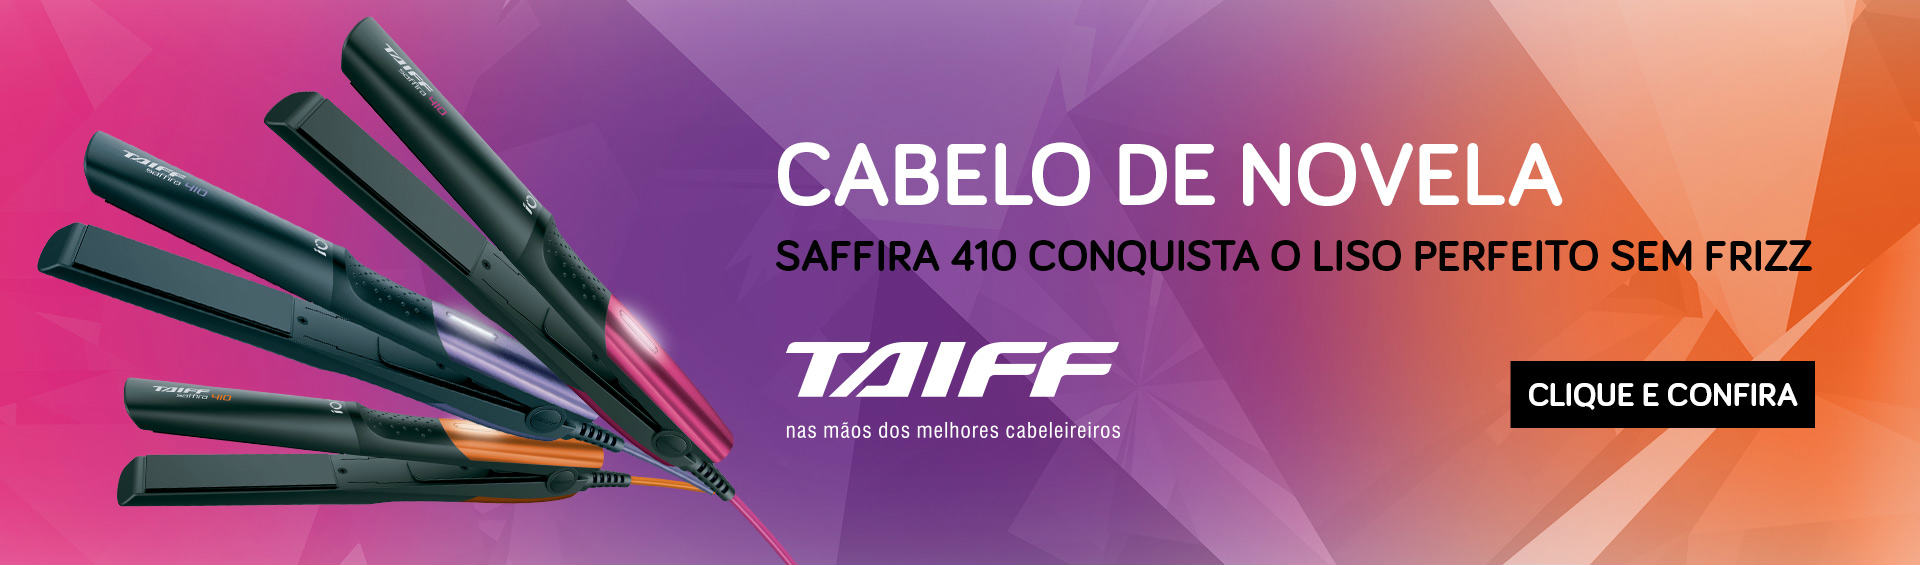 Chapa Taiff Safira